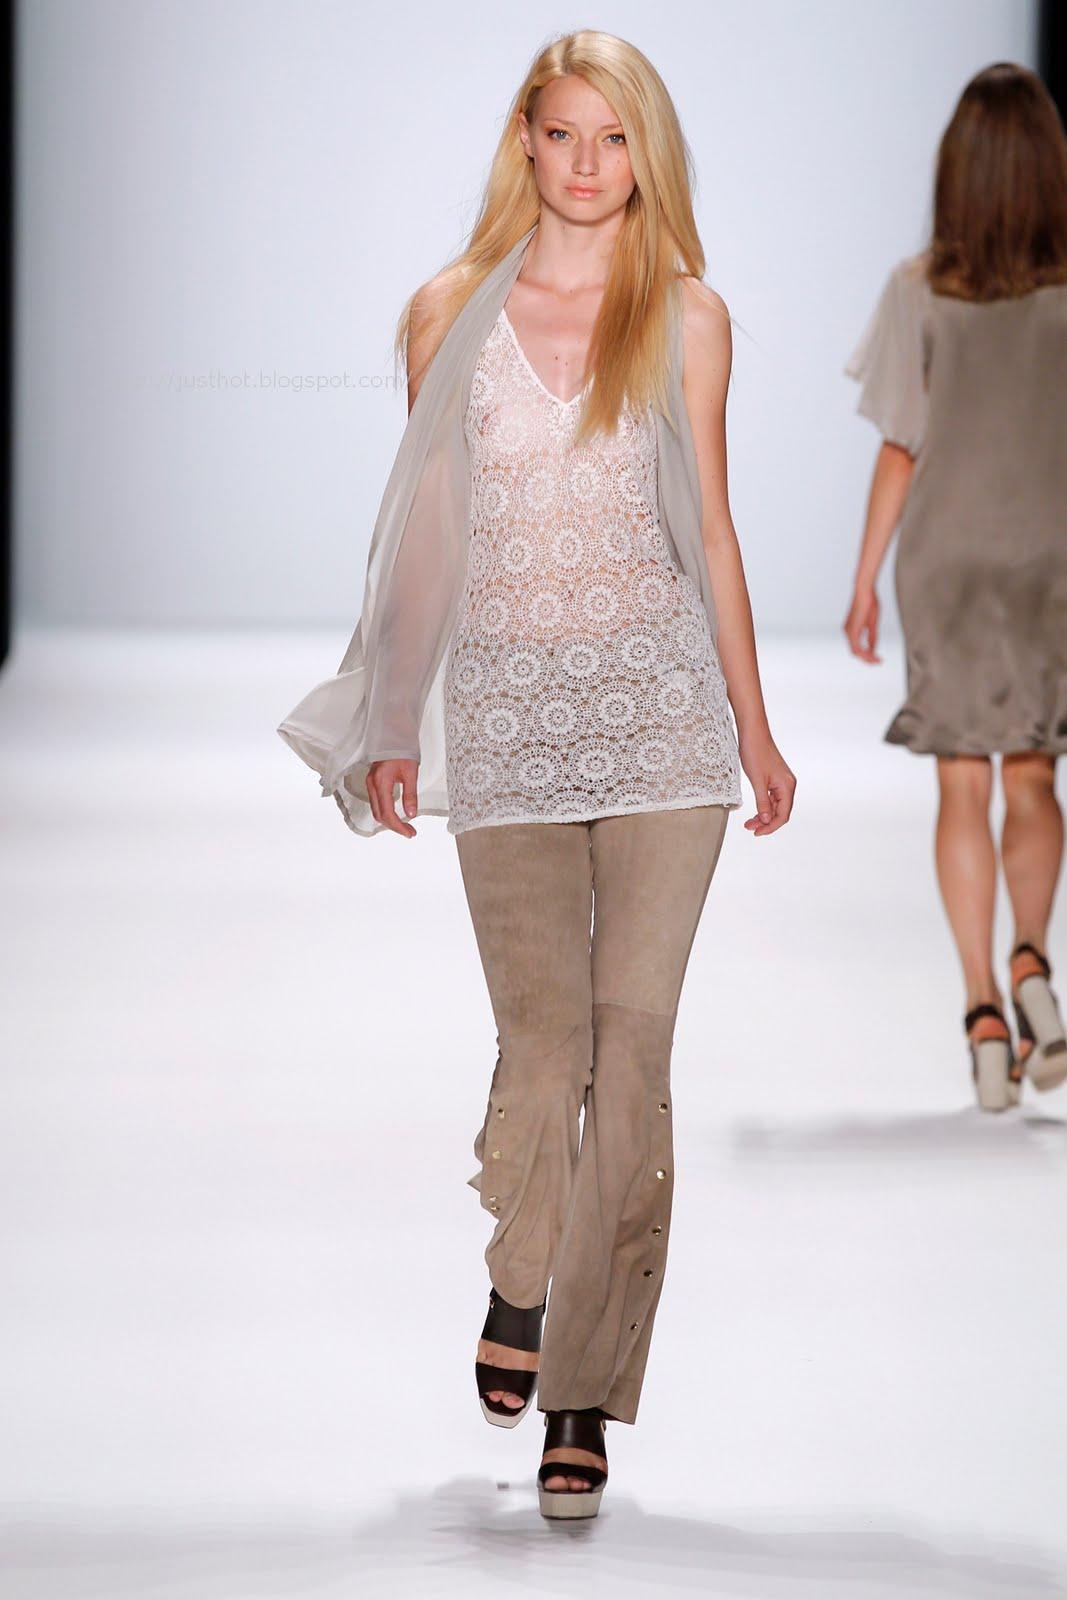 Fashion Show Models On Runway